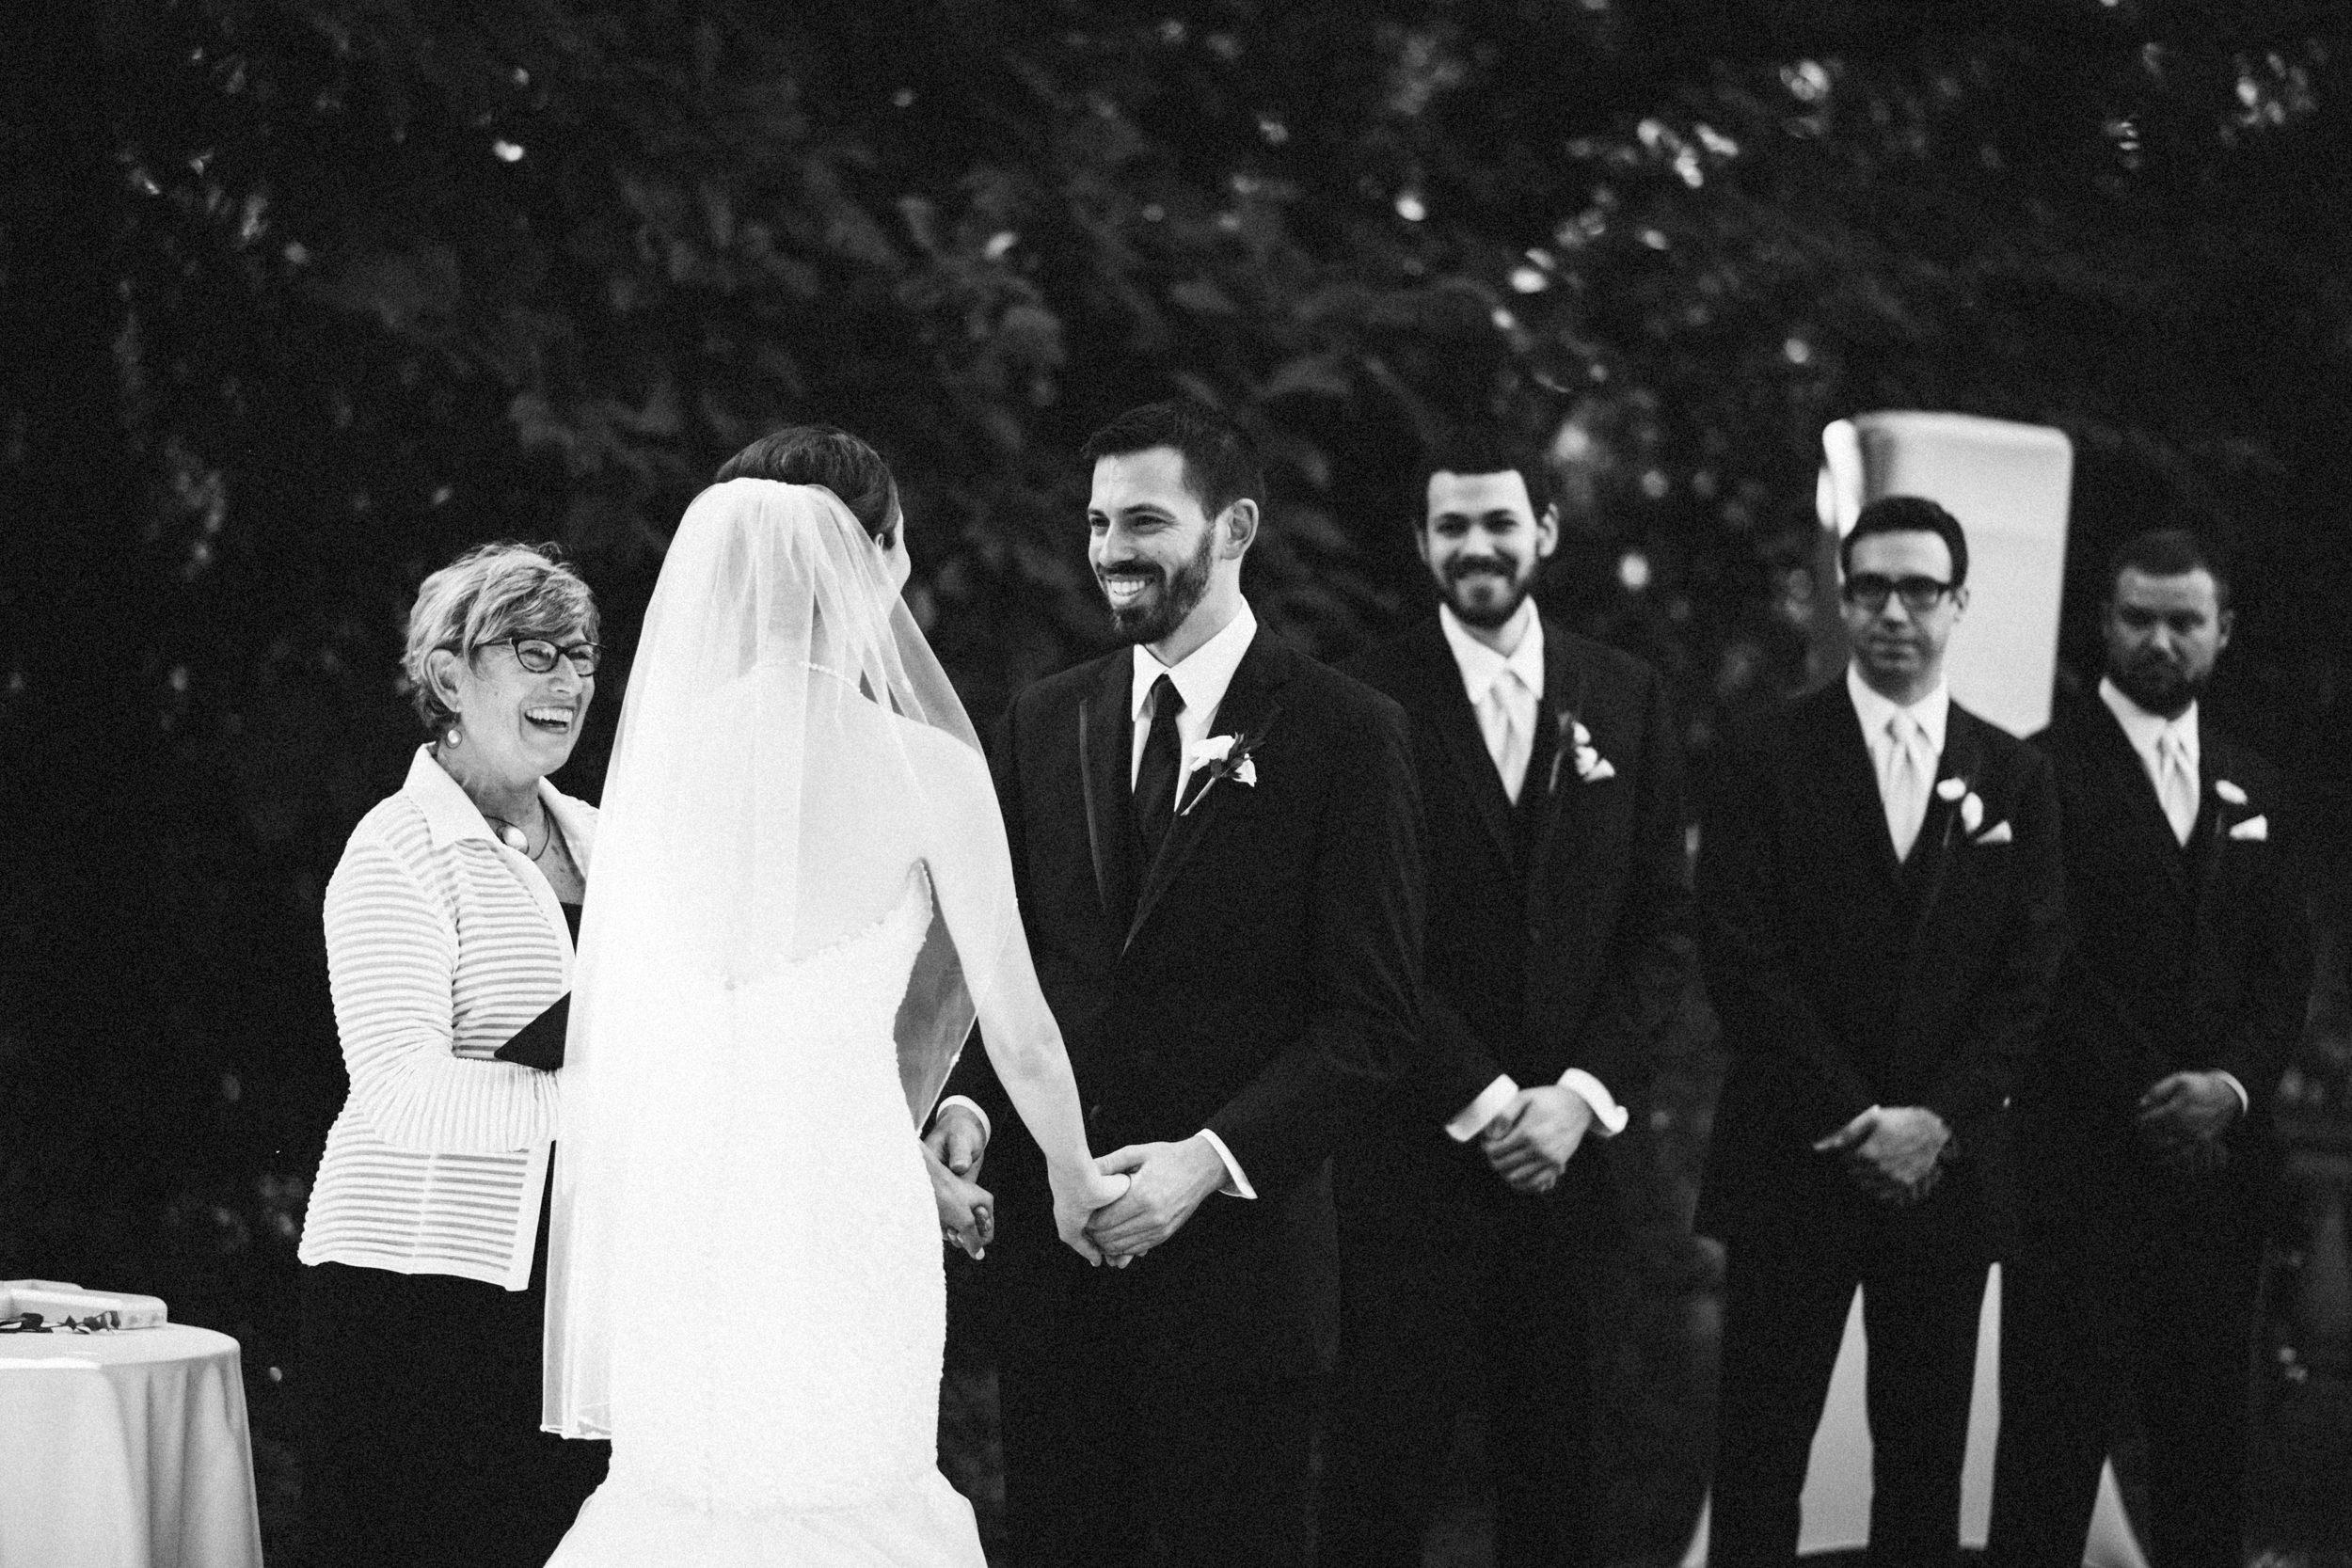 Louisville-Kentucky-Wedding-Elopement-Photographer-Sarah-Katherine-Davis-Photography-Whitehall-Classic-Timeless-Garden-Wedding-355.jpg